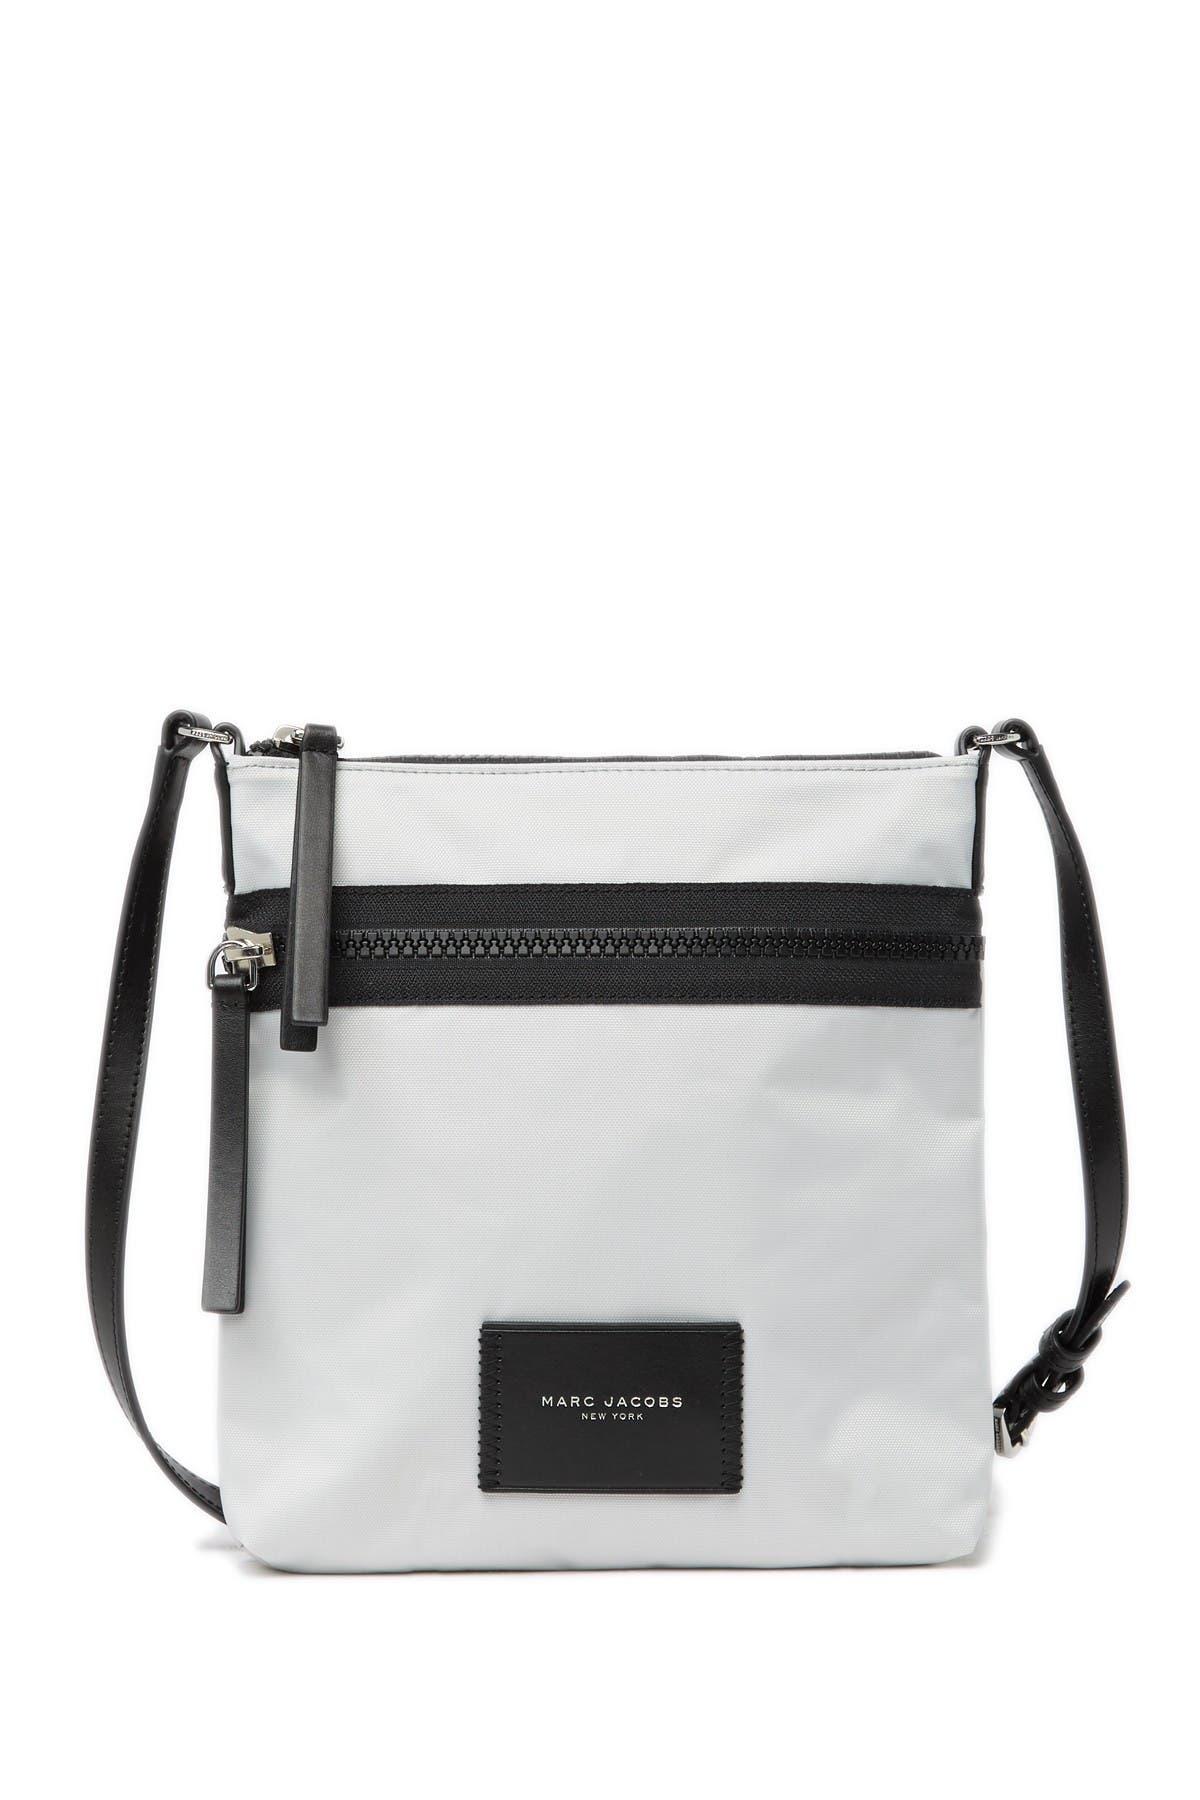 Image of Marc Jacobs NS Crossbody Bag